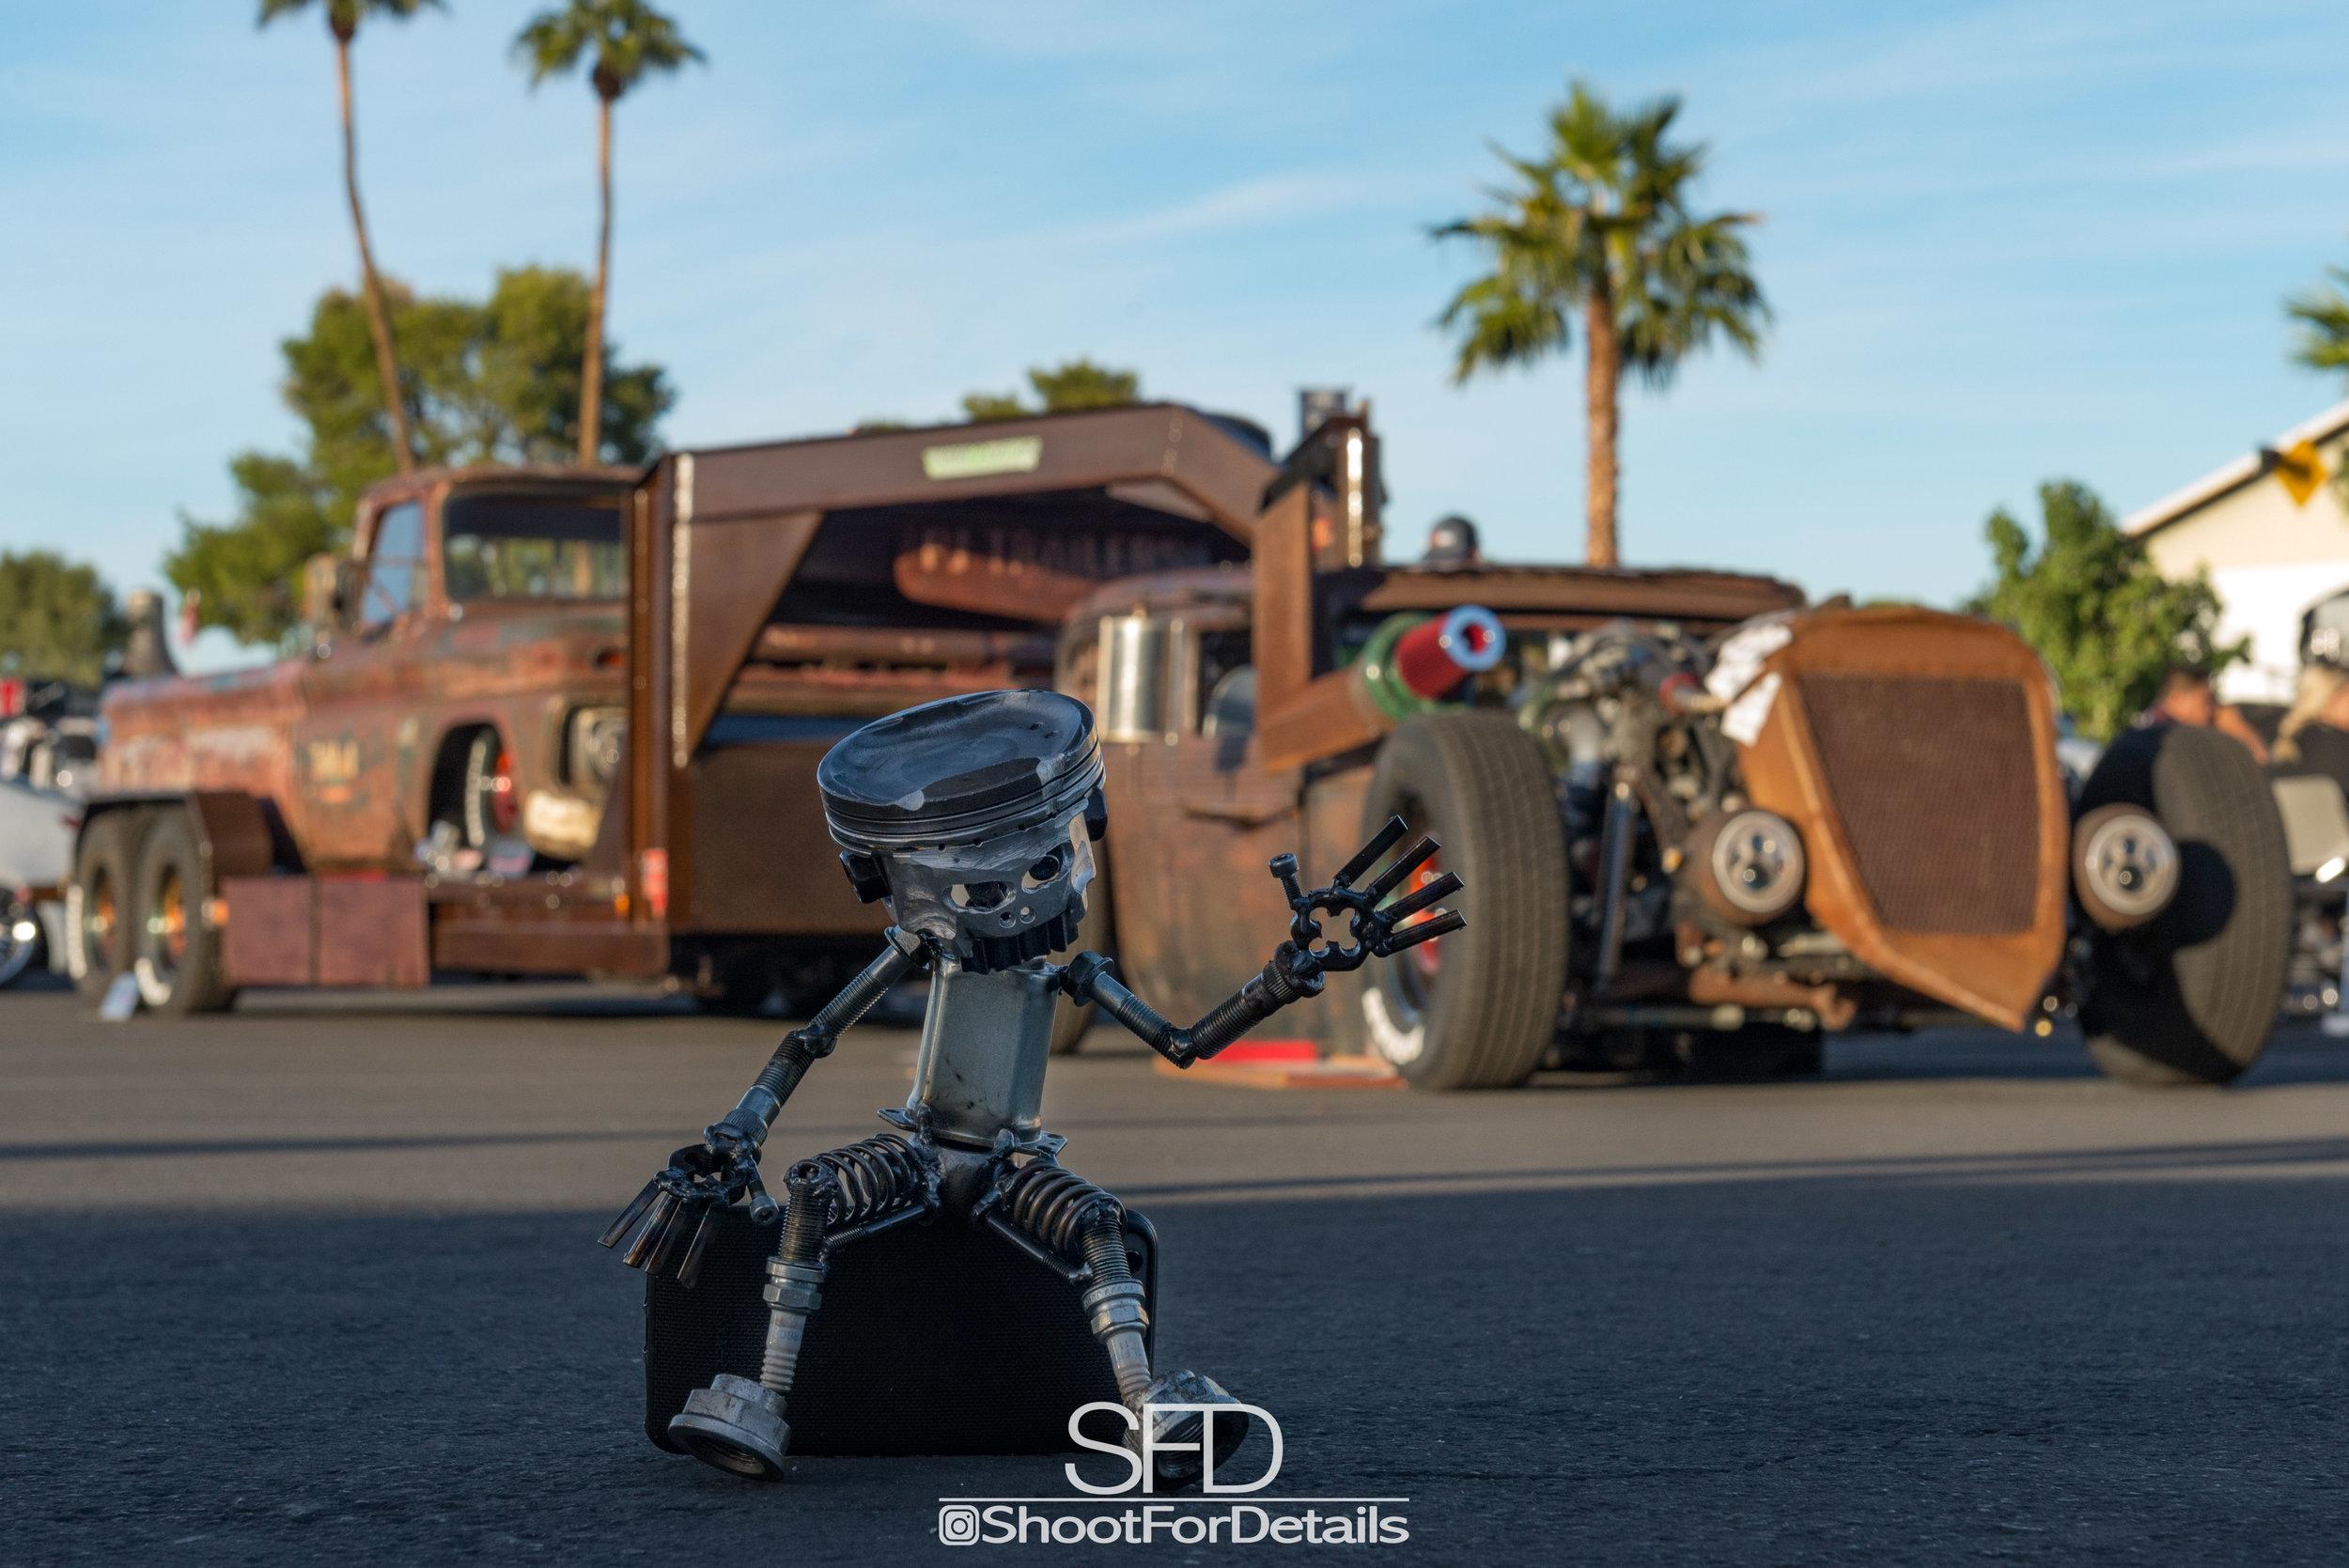 SFD_9111-Edit.jpg